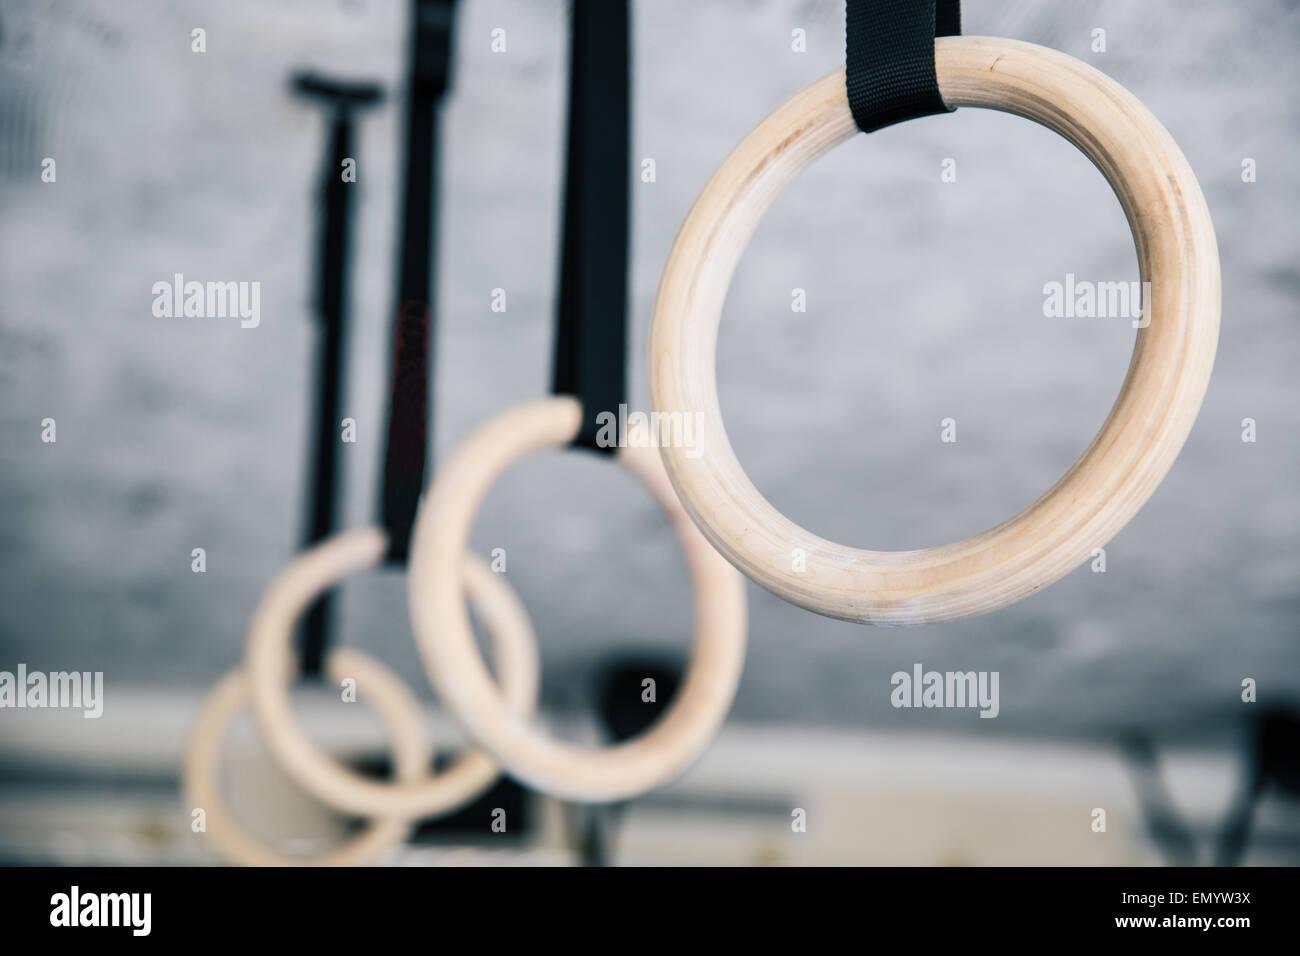 Closeup imagen de fitness en el gimnasio anillos Imagen De Stock